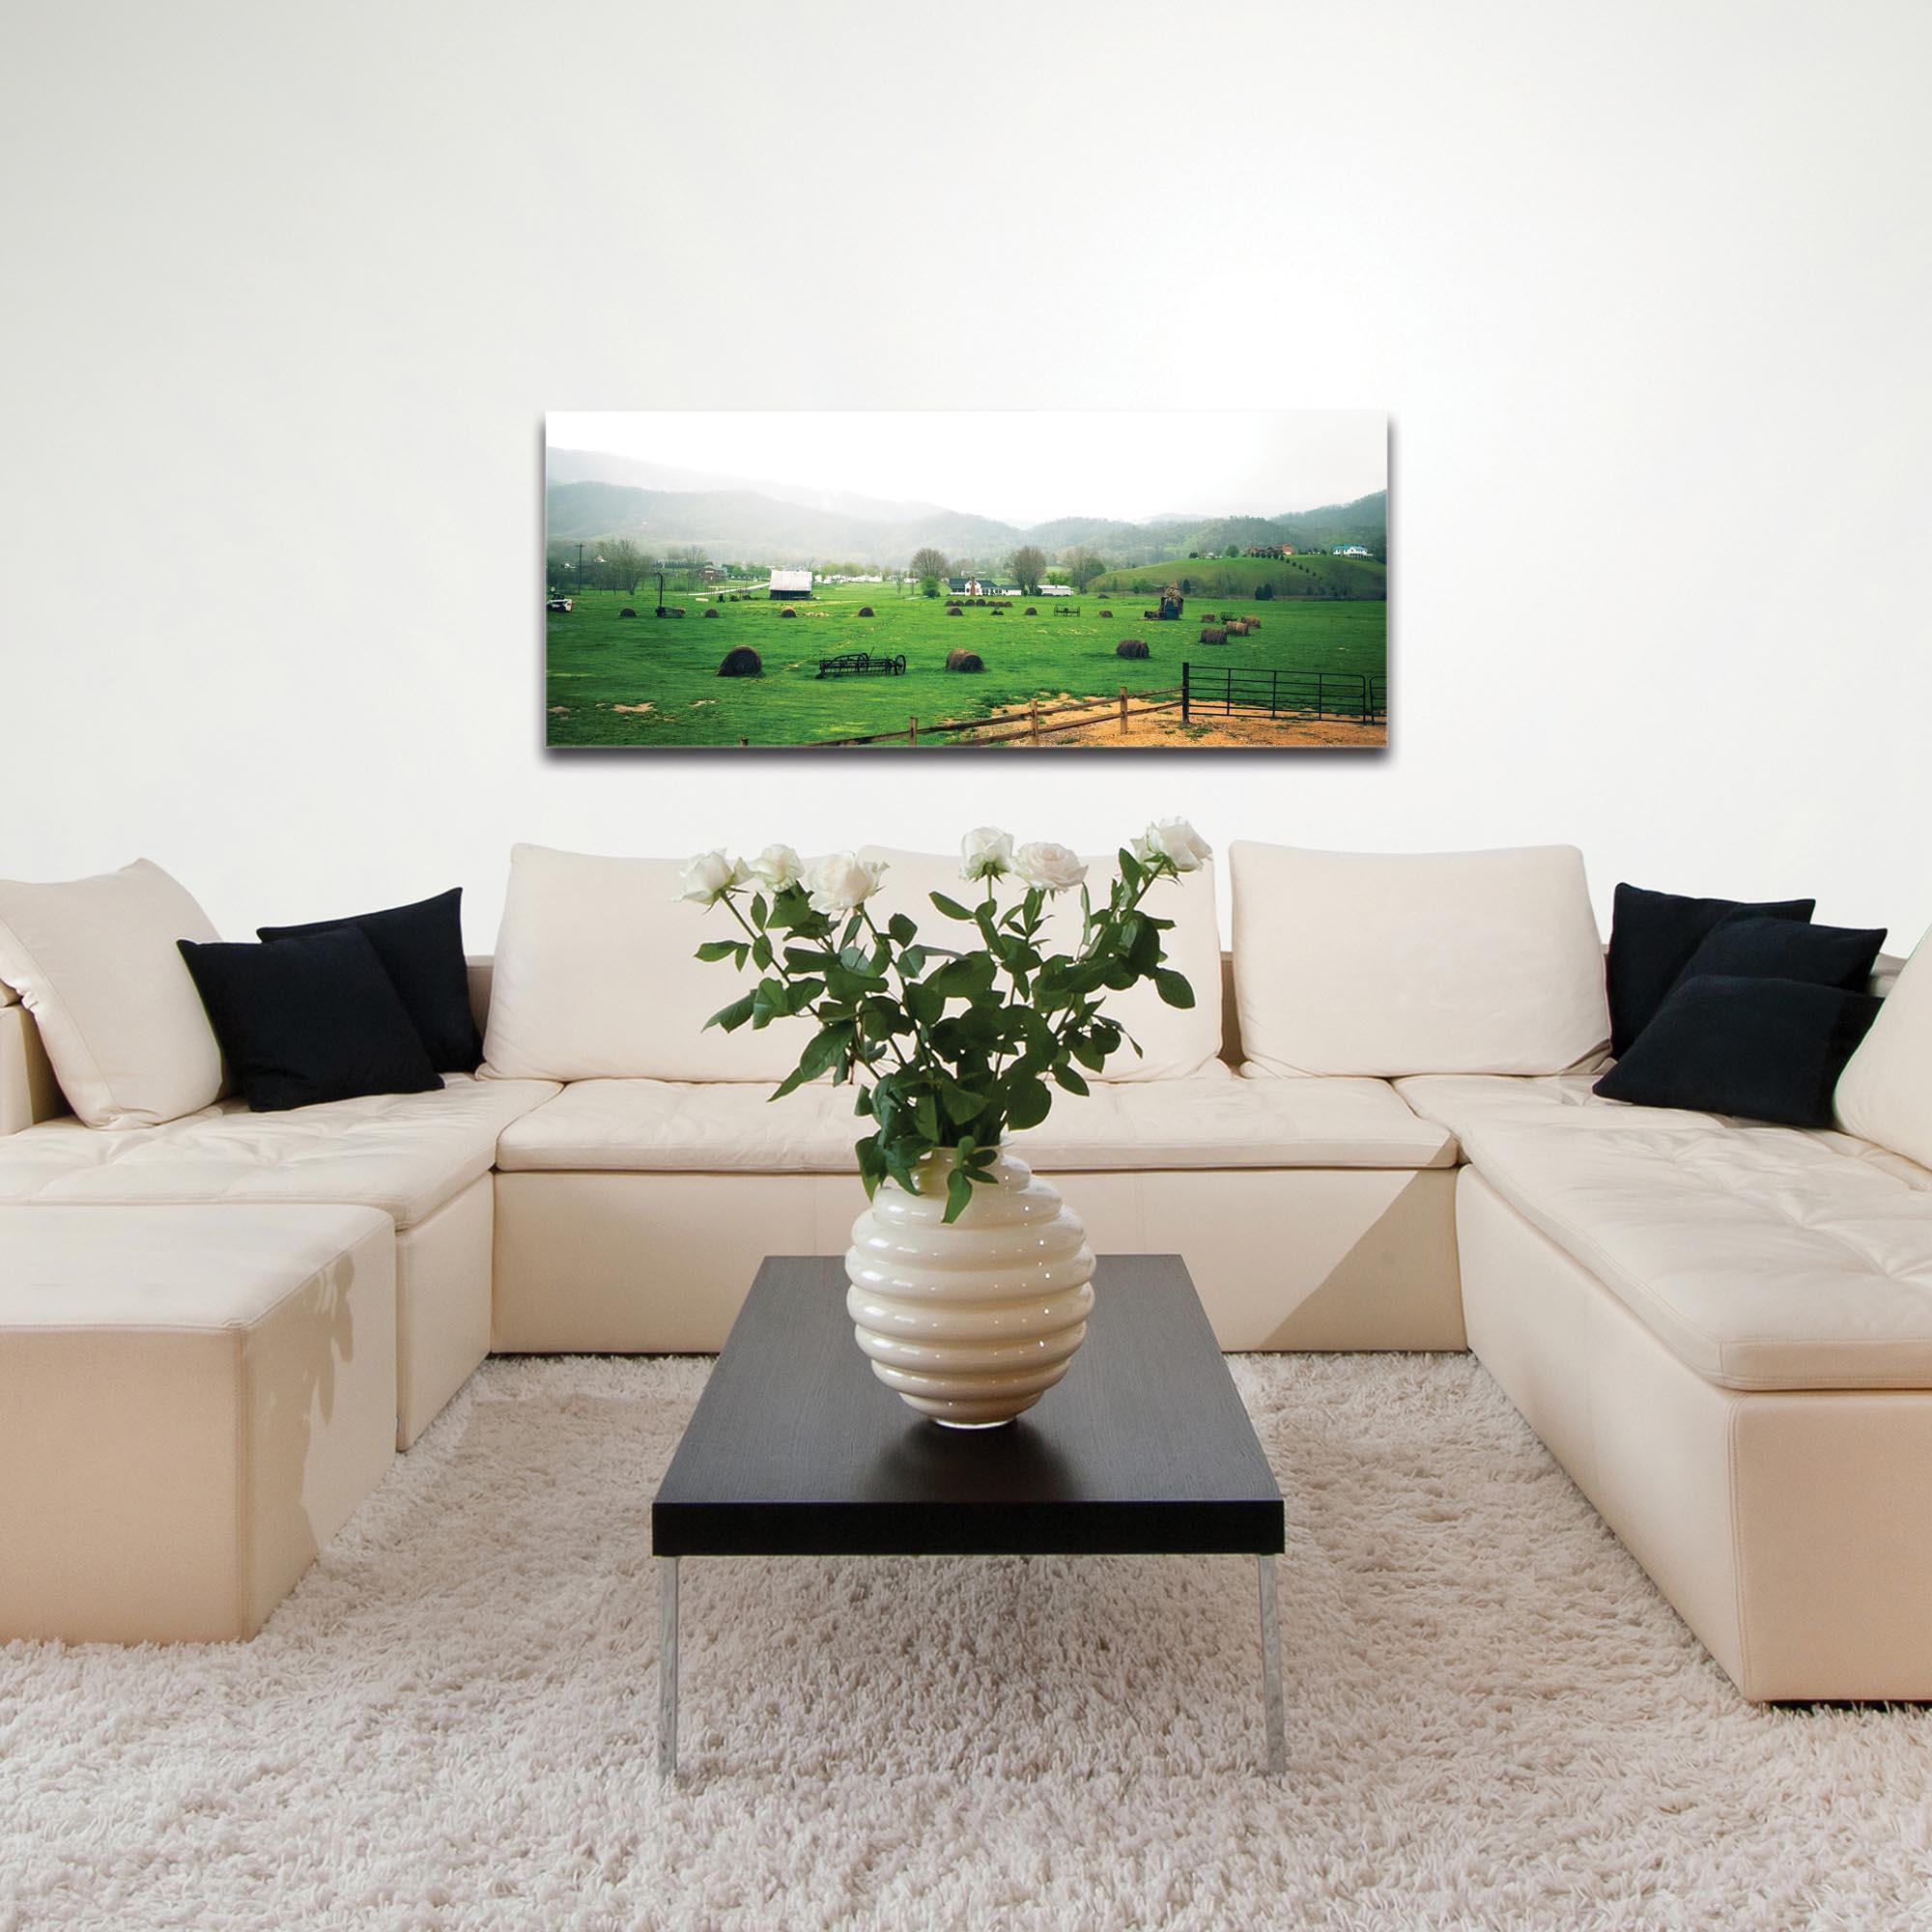 Western Wall Art 'Farming Town' - Farm Landscape Decor on Metal or Plexiglass - Image 3